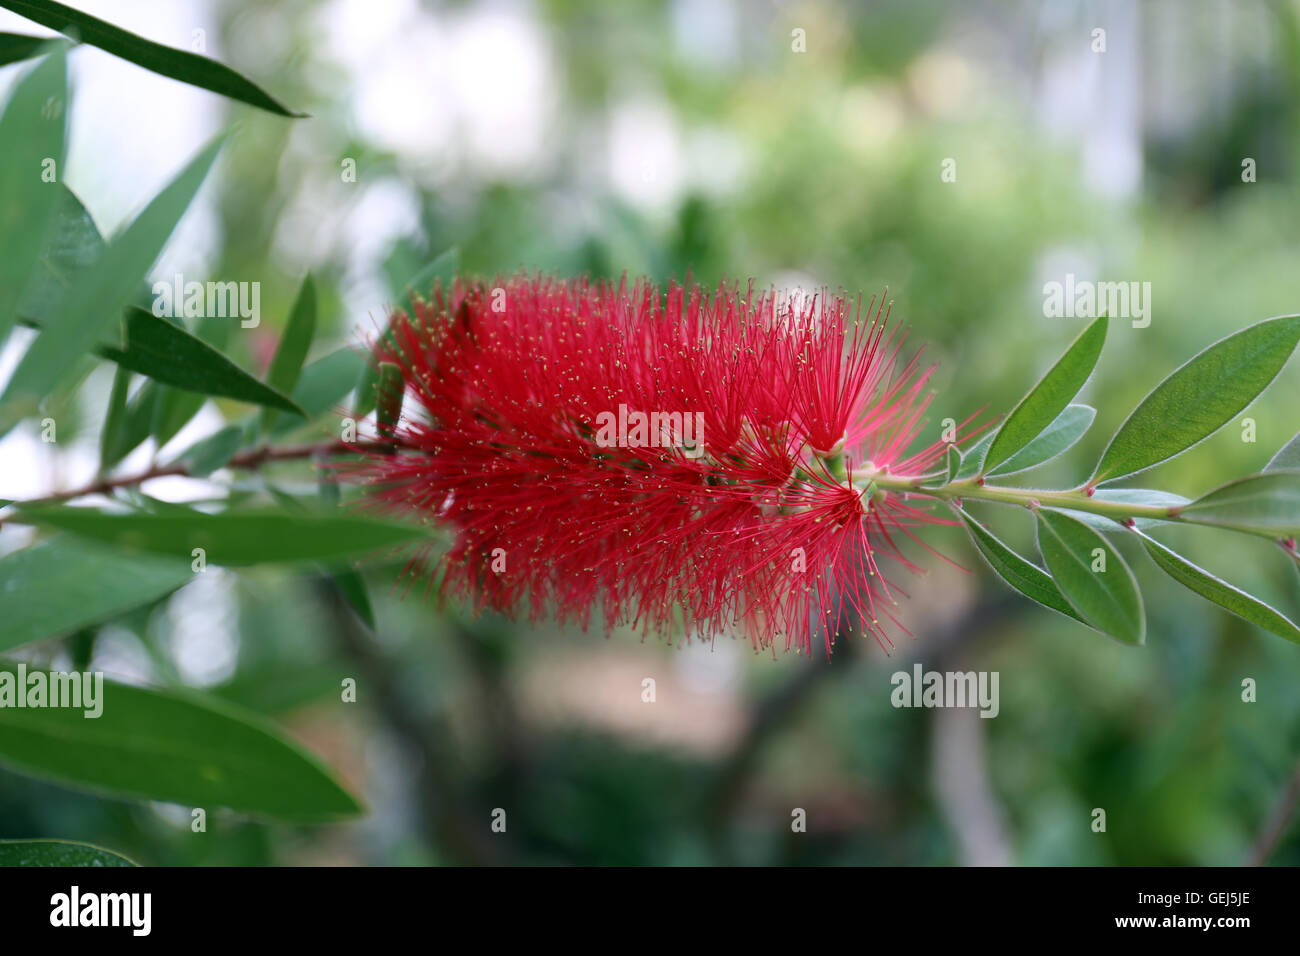 Callistemon Myrtaceae,bottle brush - Stock Image